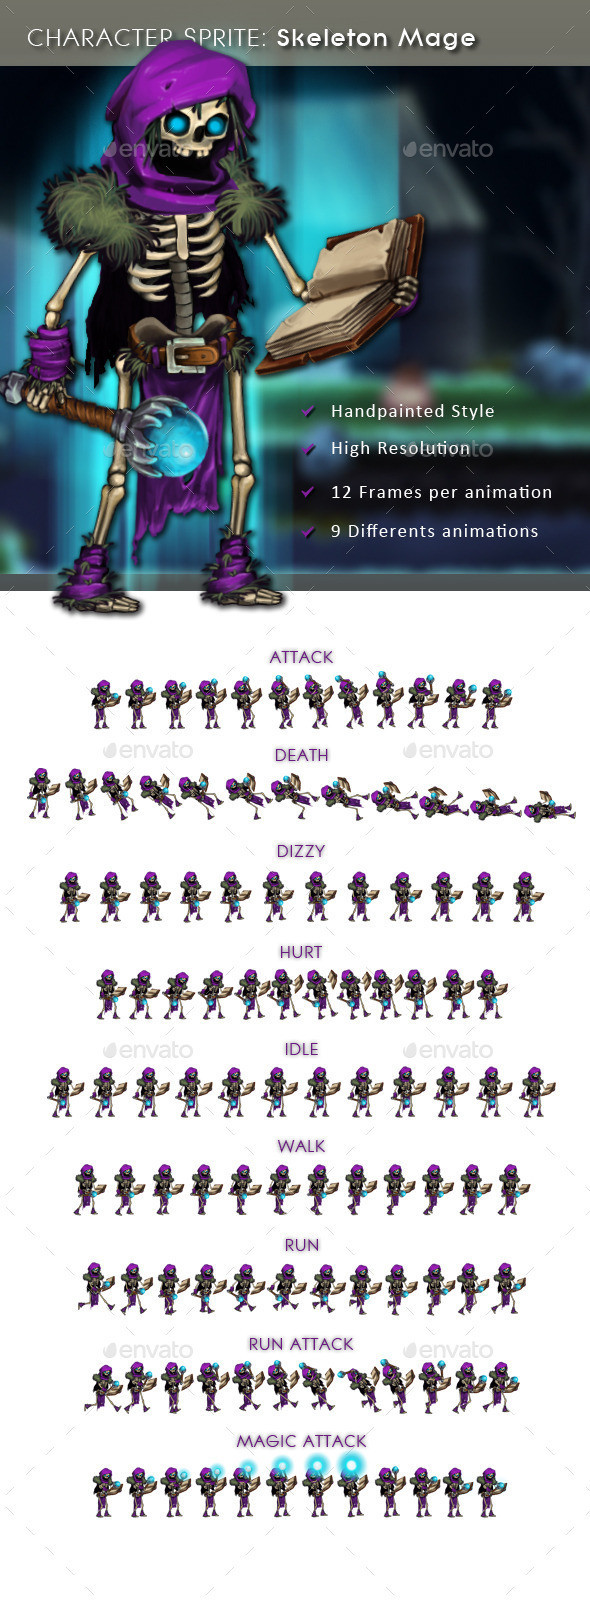 Character Sprite: Skeleton Mage | Themestack net